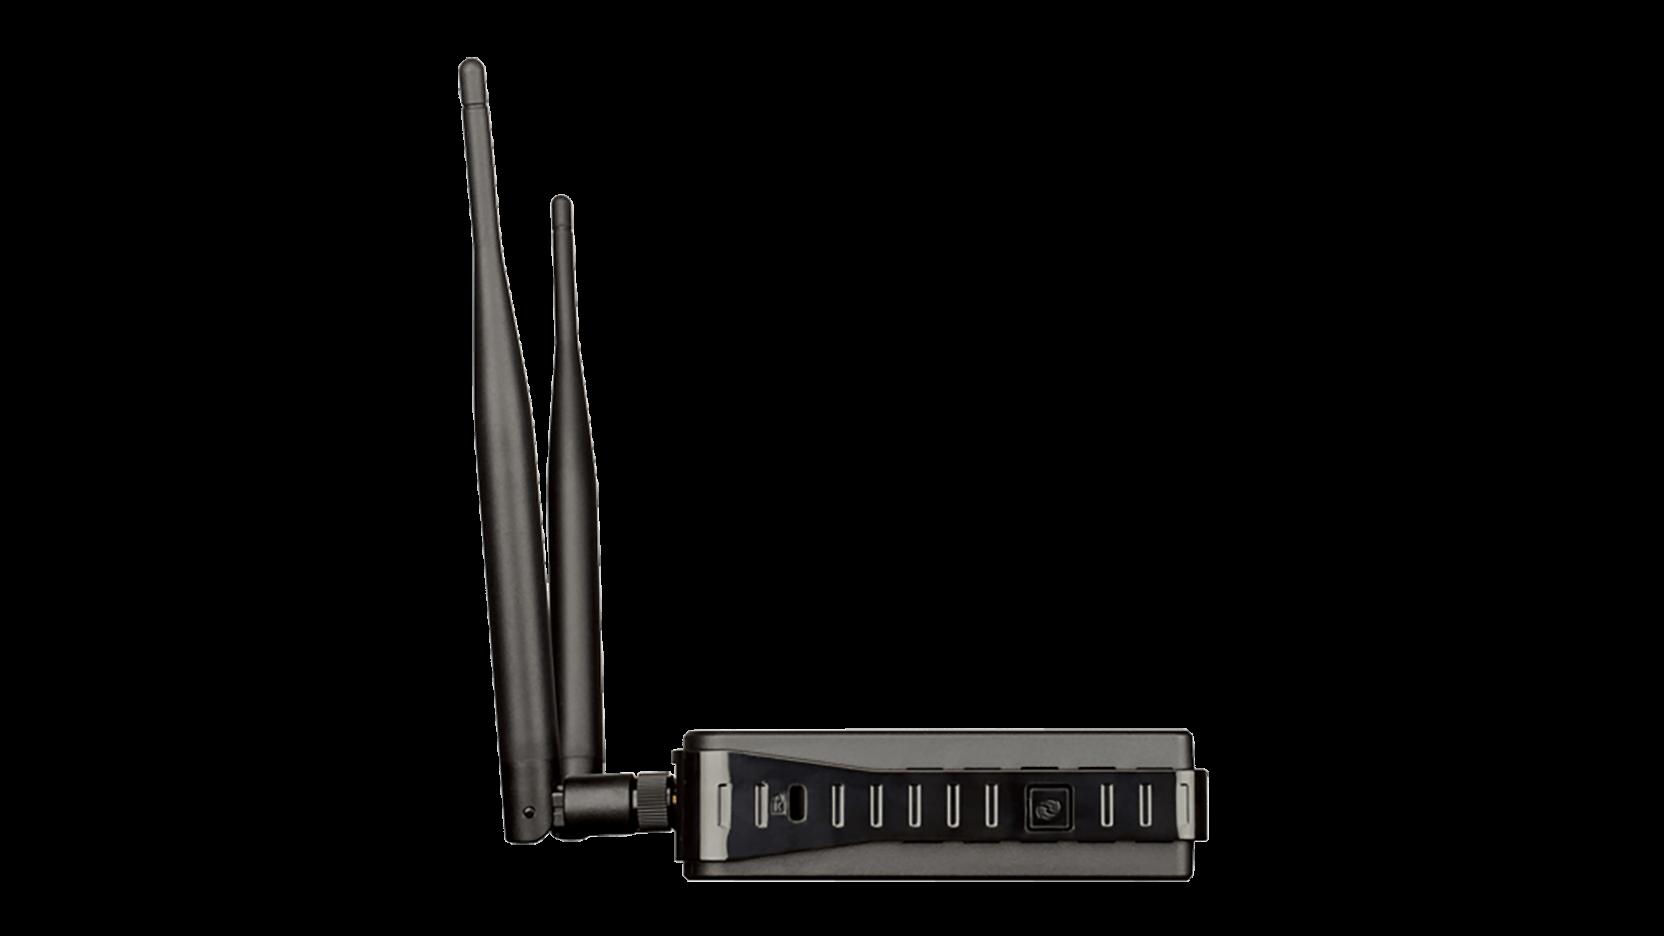 Dap Punto De Acceso Wireless N De Codigo Abierto